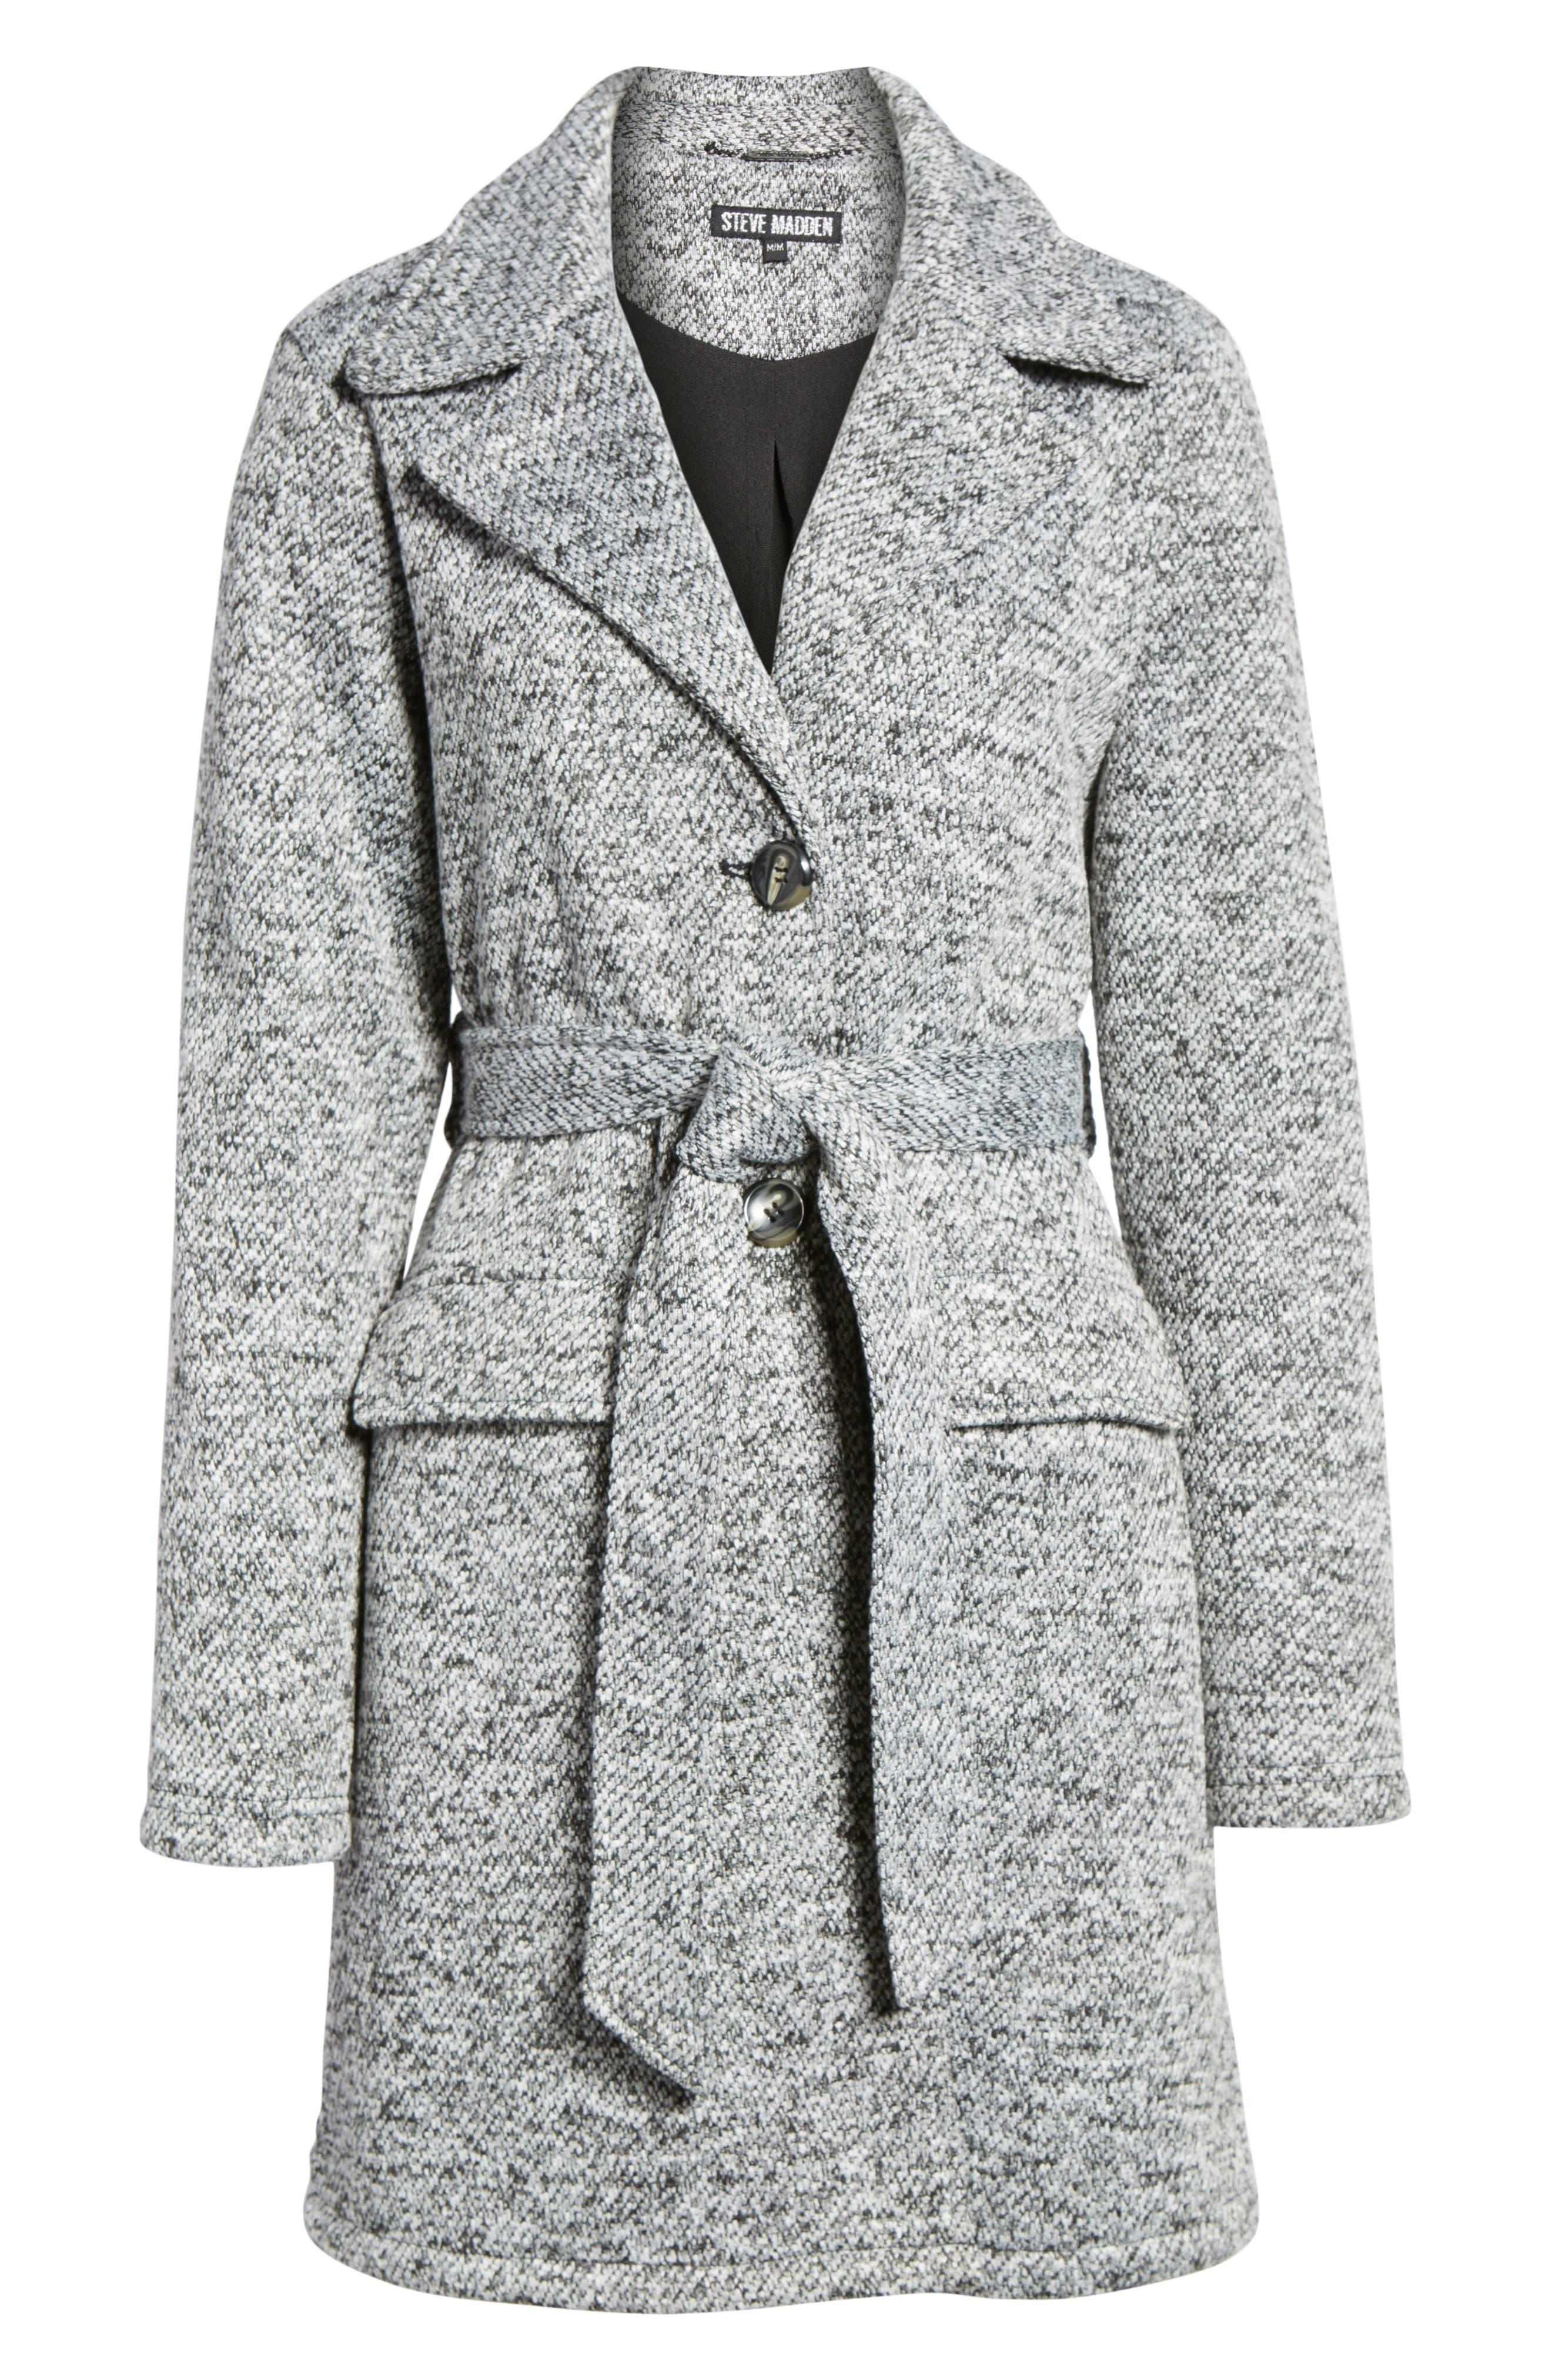 Belted Fleece Jacket,                             Alternate thumbnail 6, color,                             Light Grey Heather